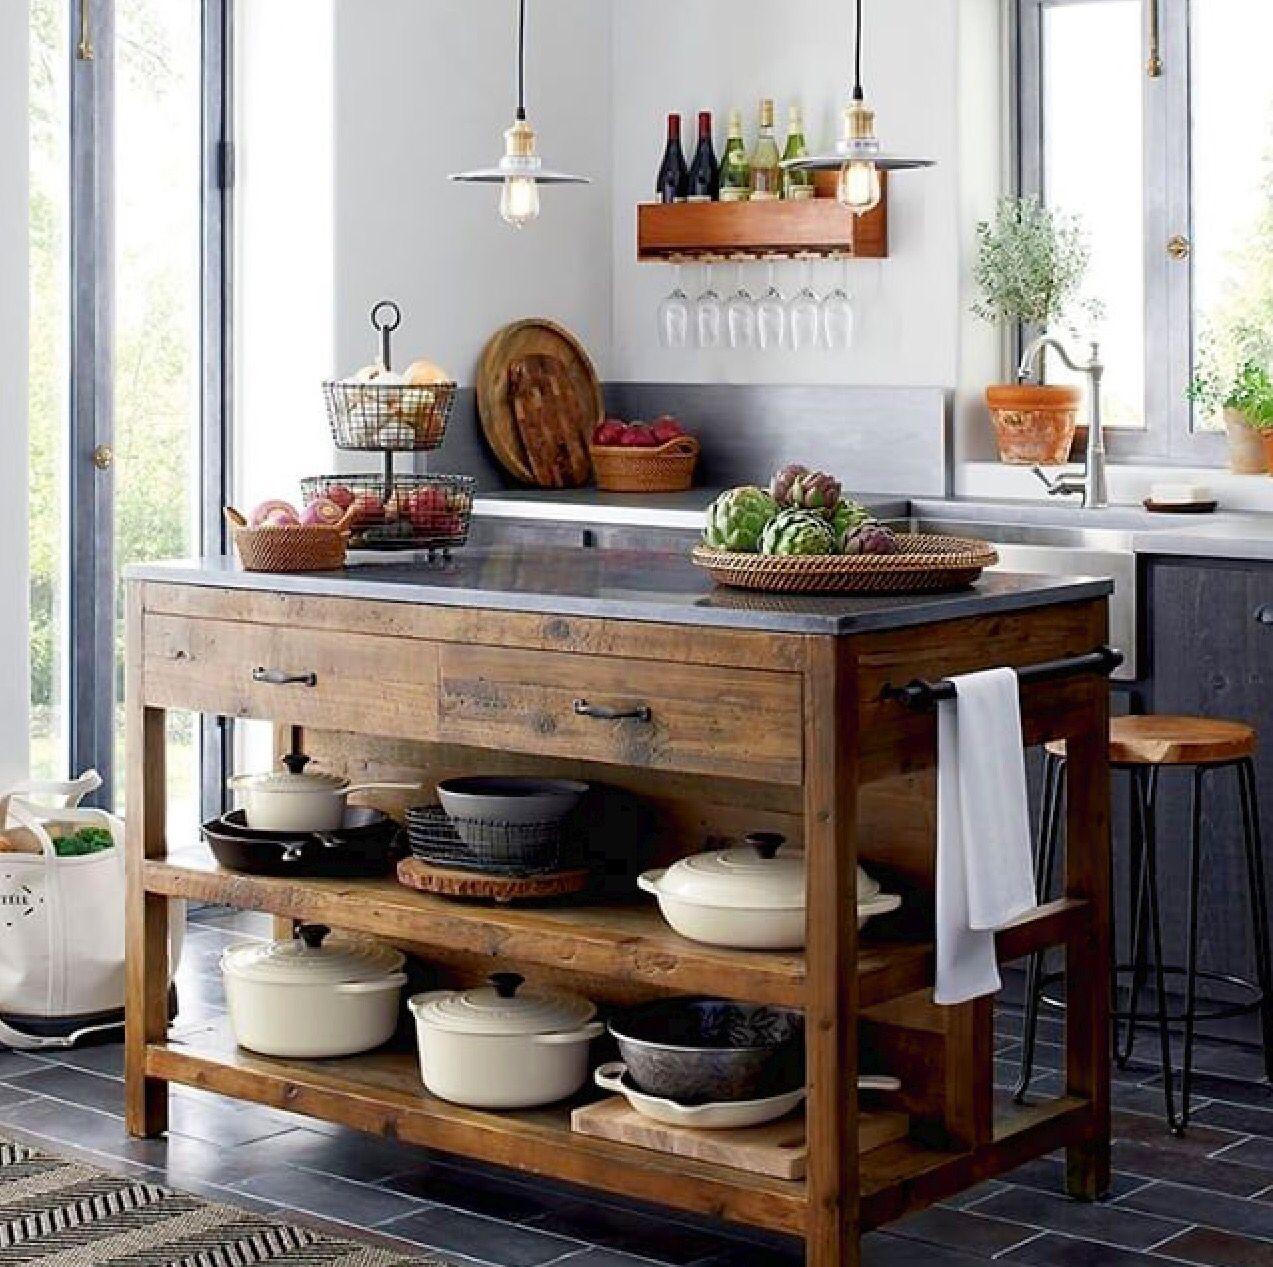 Narrow Country Kitchen: Decoracion De Cocinas